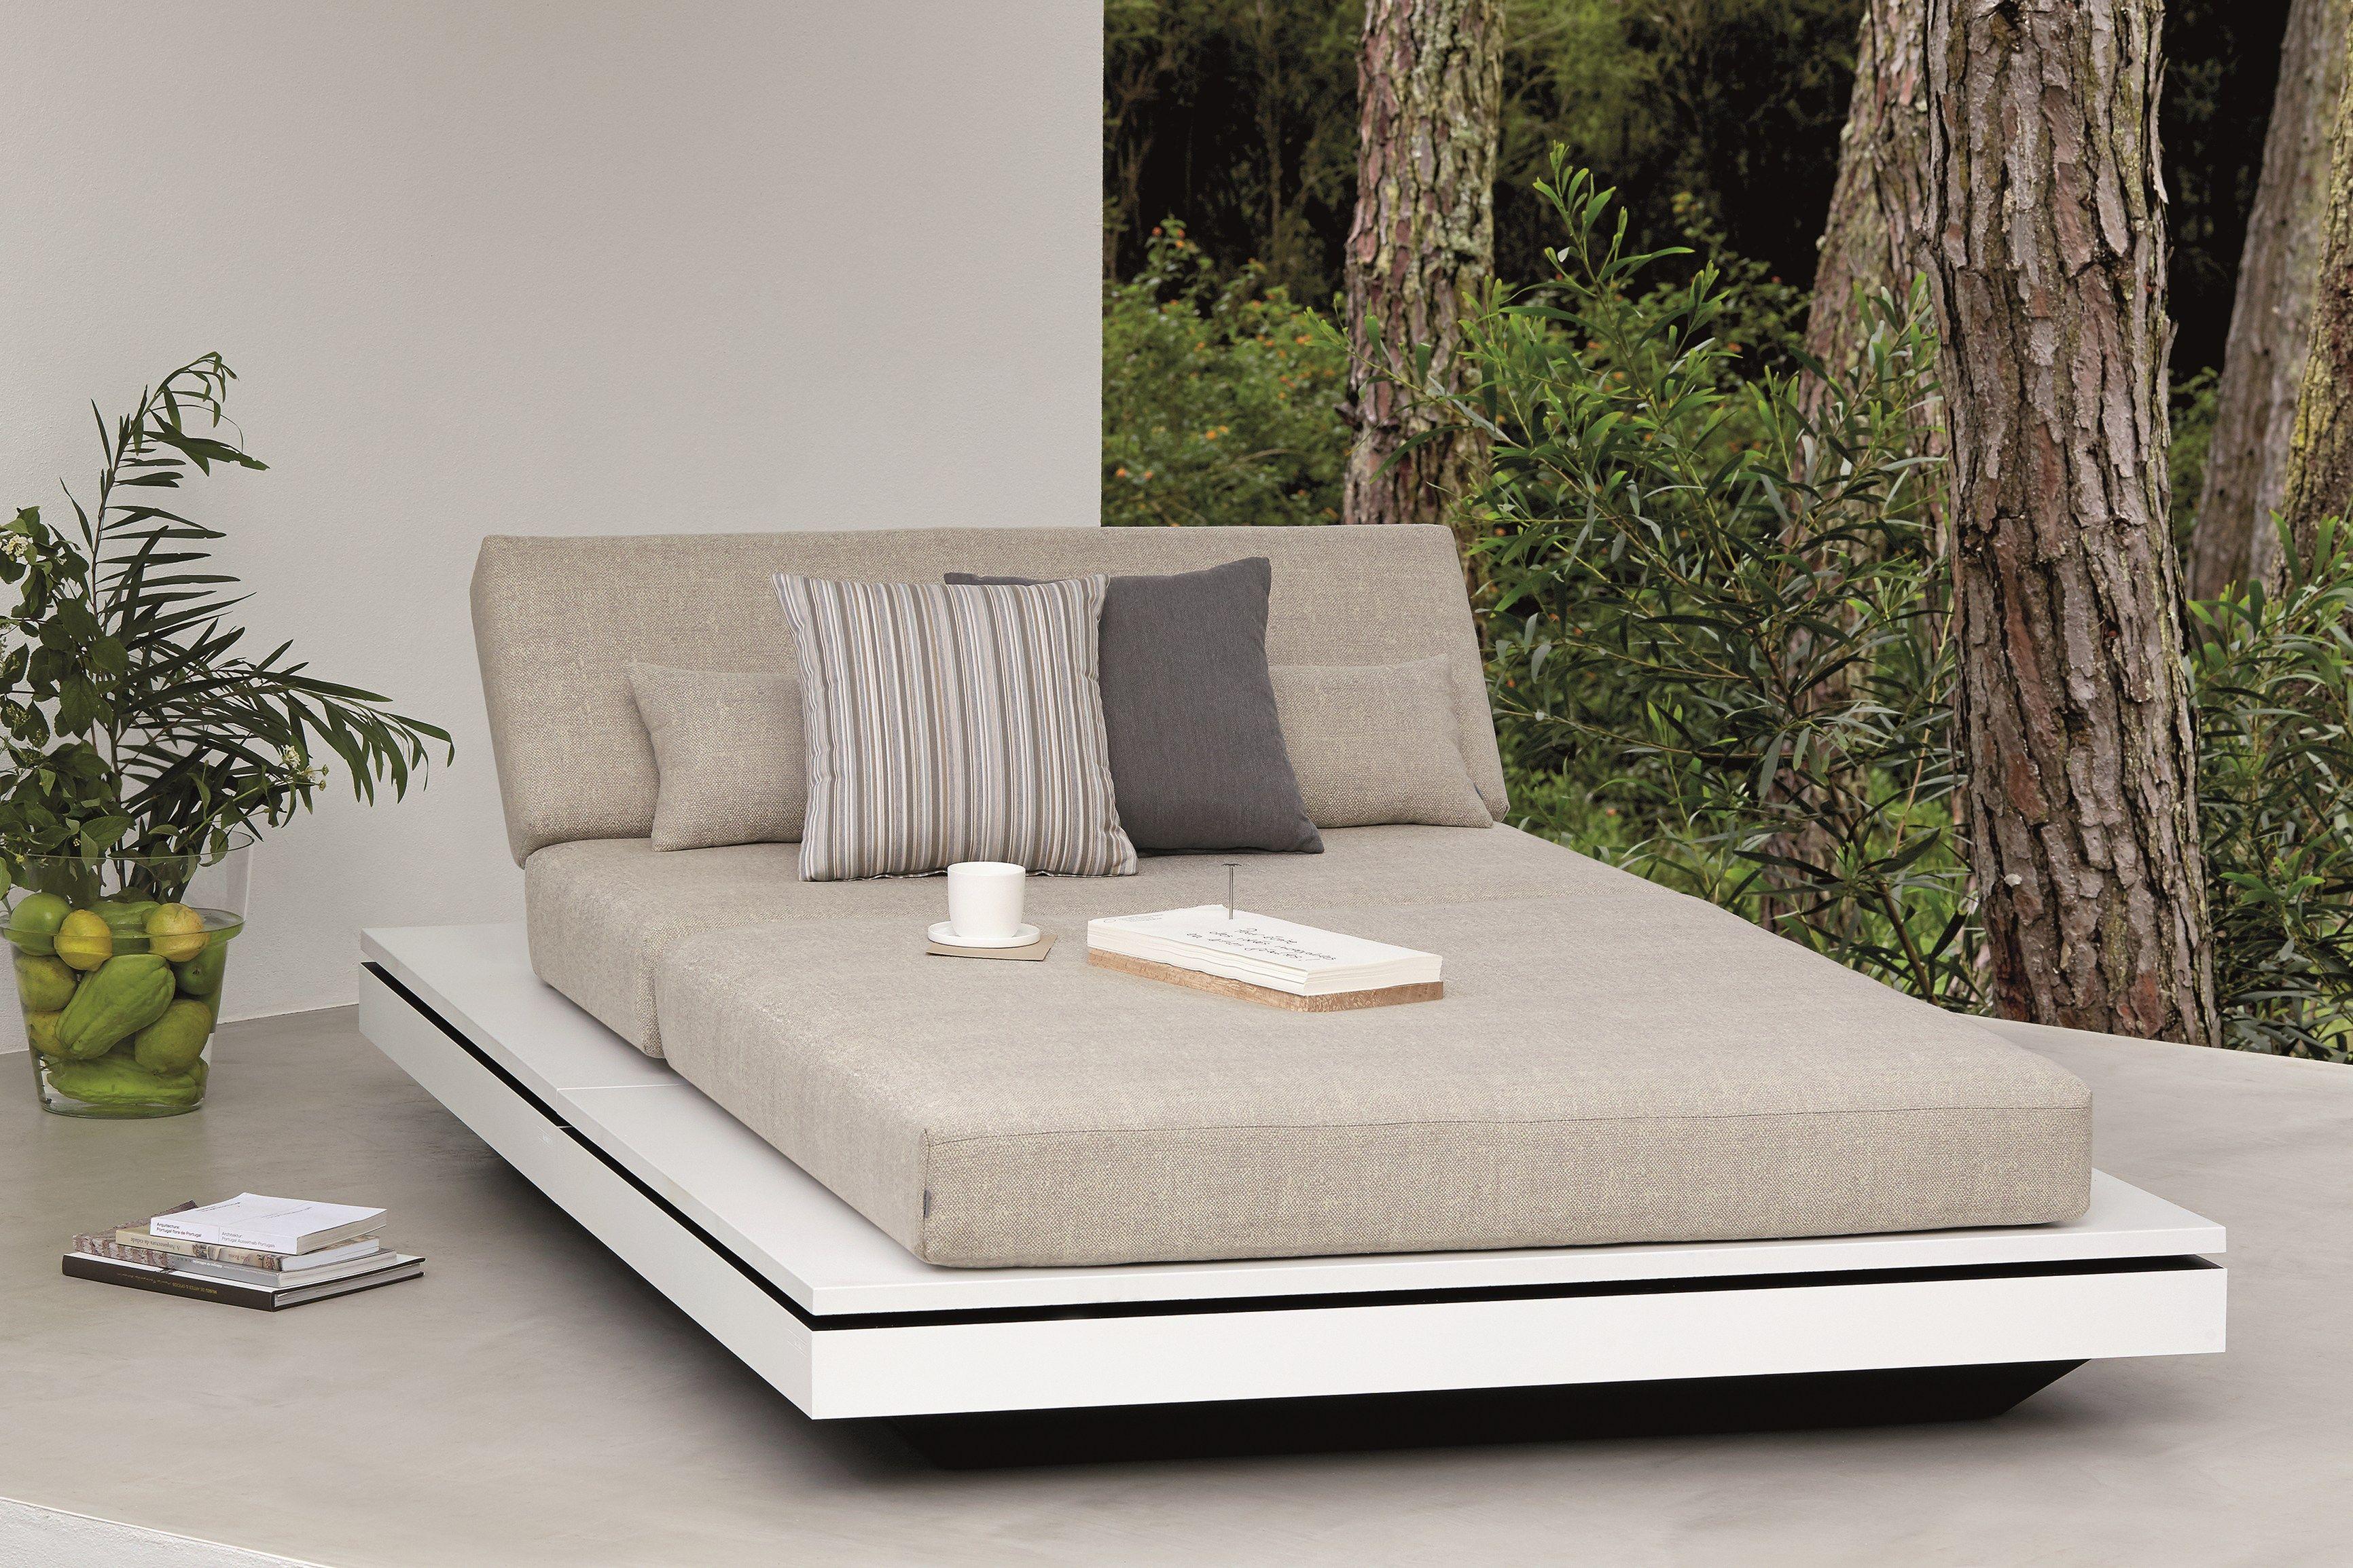 Elements letto da giardino by manutti design gerd couckhuyt for Letto giardino